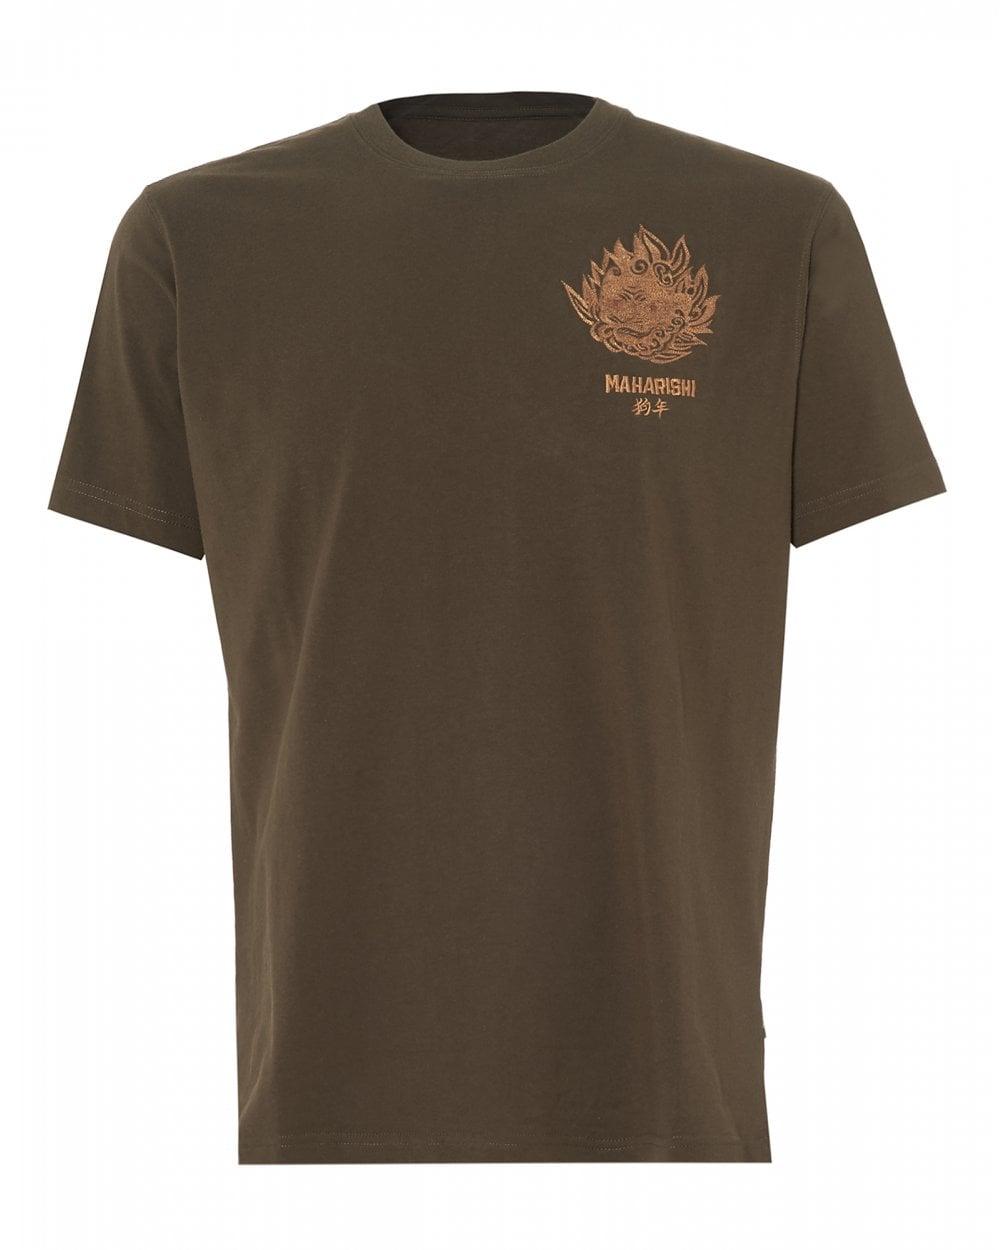 20380a11 Maharishi Mens Komainu Logo T-Shirt, Olive Green Crew Neck Tee